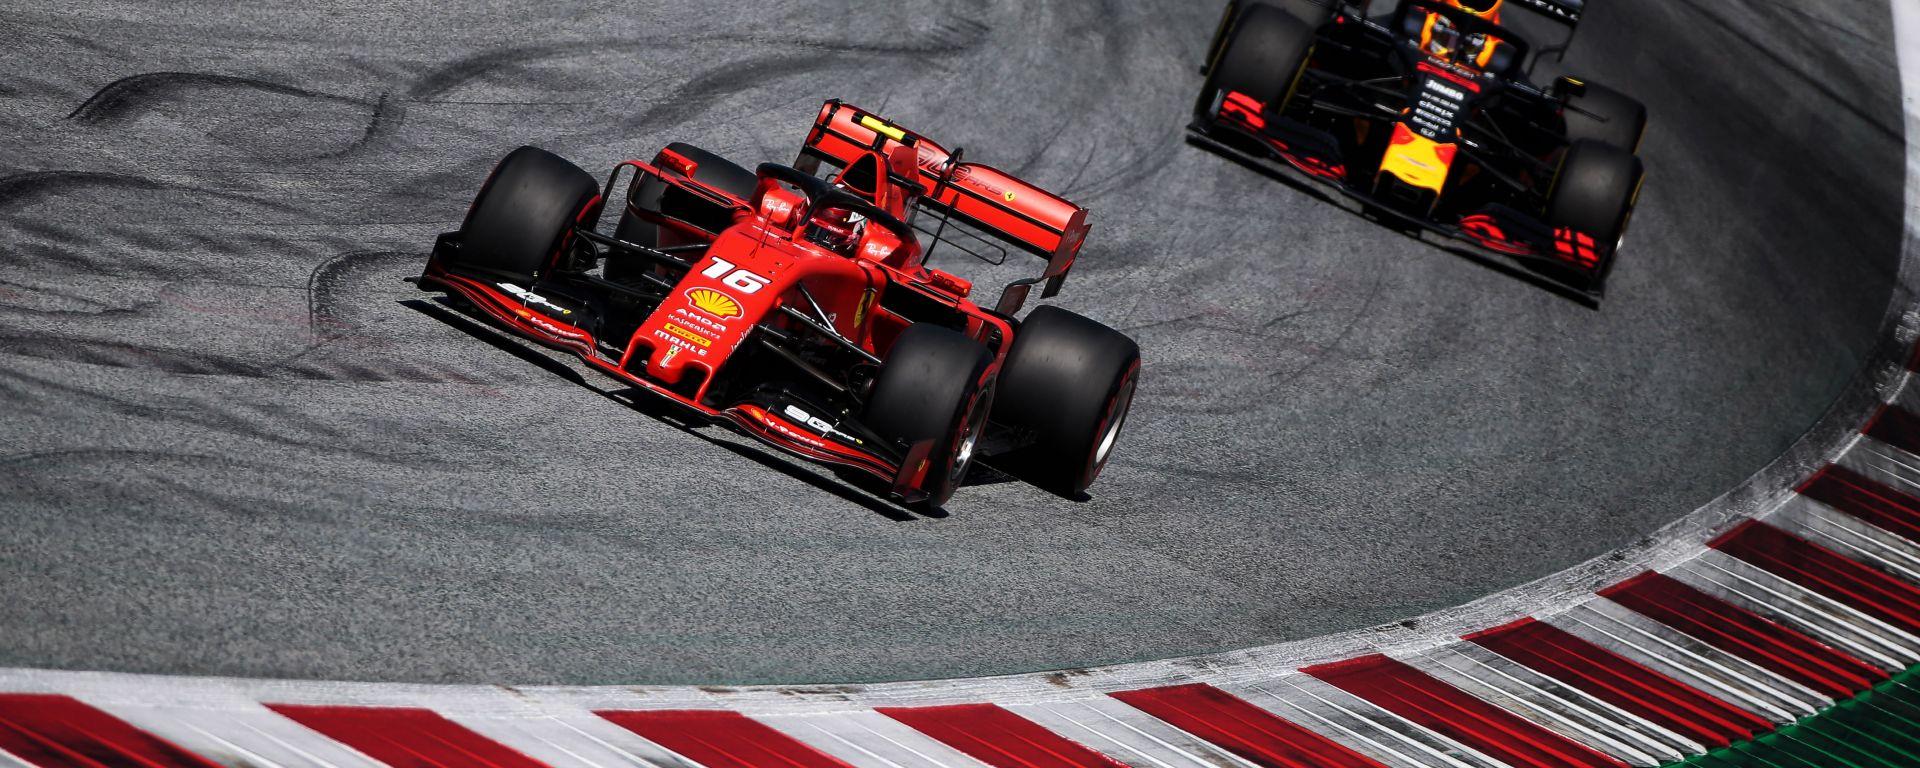 F1 GP Austria 2019, Spielberg: Charles Leclerc (Ferrari) seguito da Max Verstappen (Red Bull)